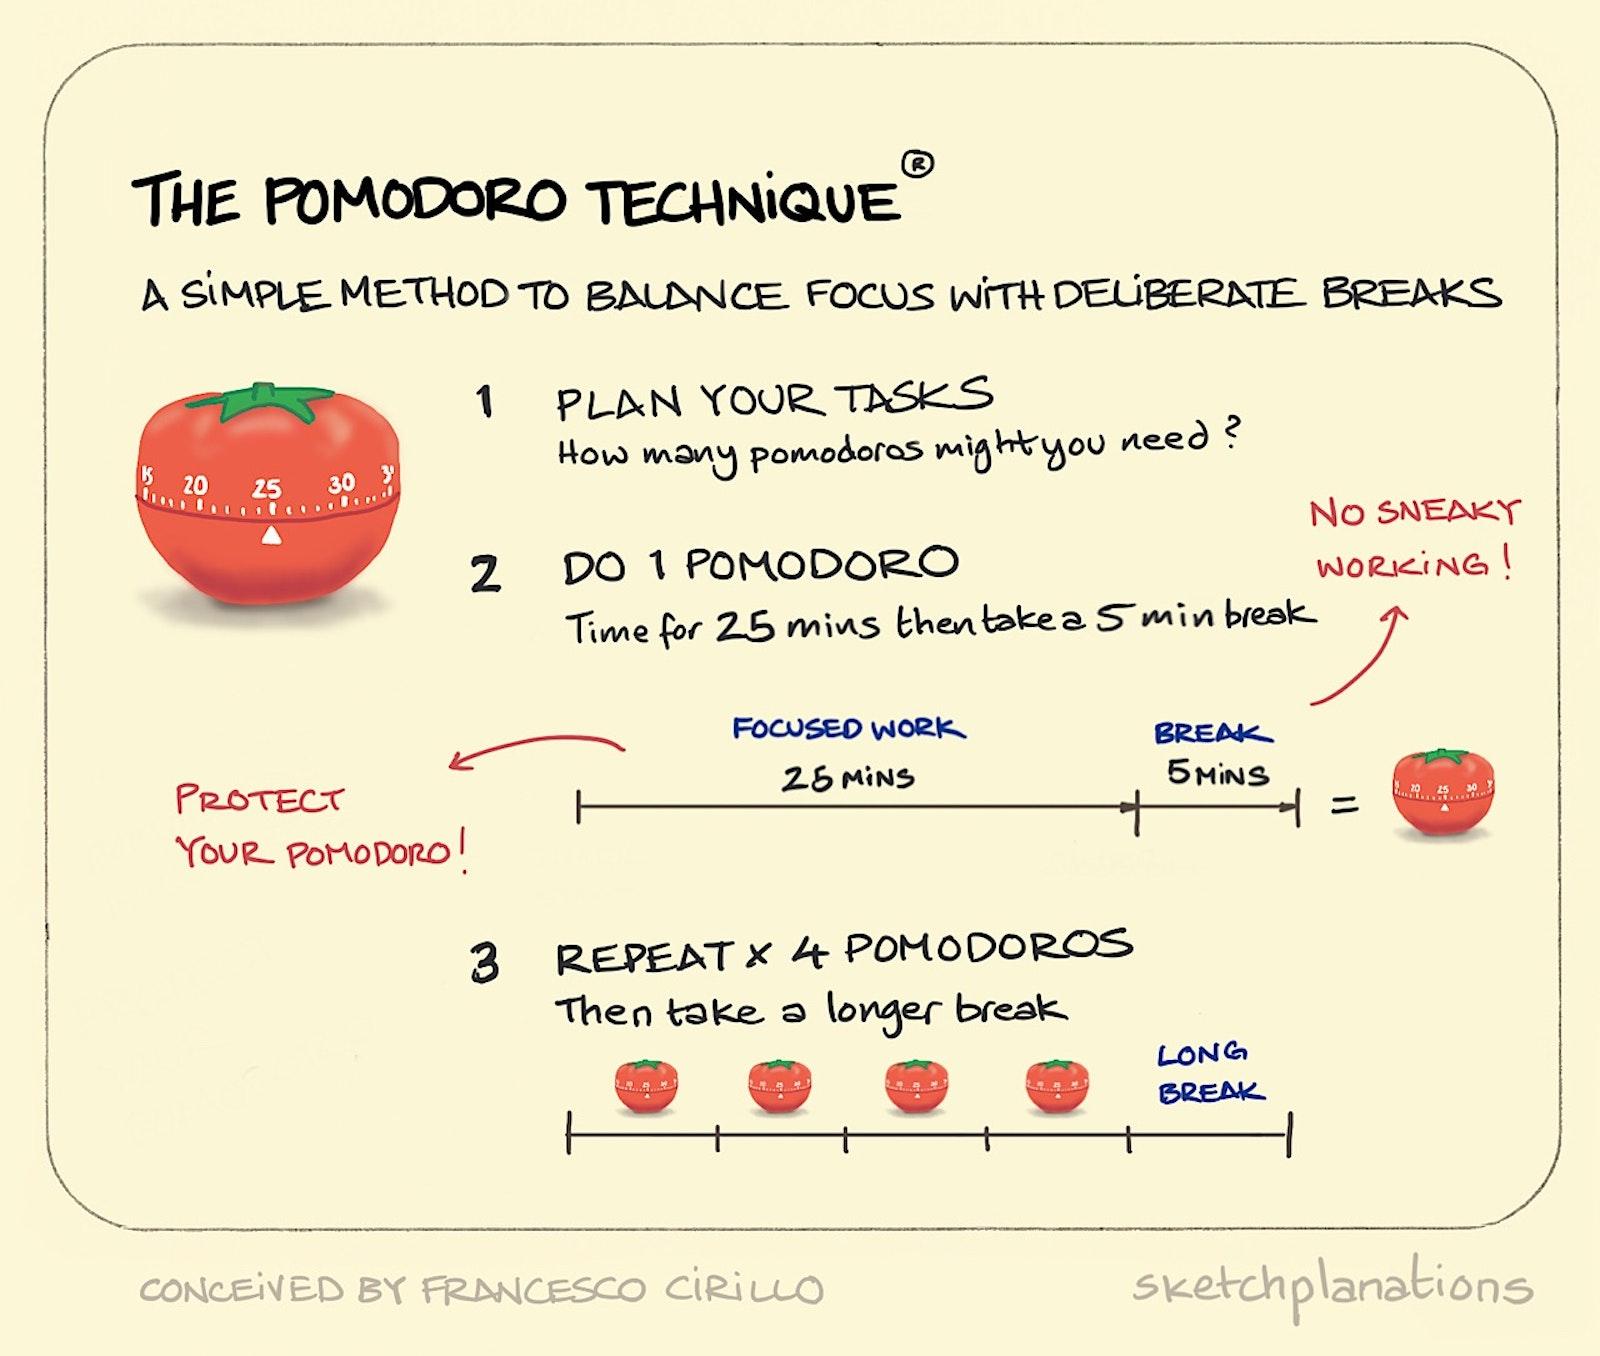 https://images.prismic.io/sketchplanations/62e61034-b66a-4ede-a5db-a5cbc39d55e7_SP+587+-+The+Pomodoro+technique.jpg?auto=format&ixlib=react-9.0.3&h=1887.557603686636&w=1600&q=75&dpr=1